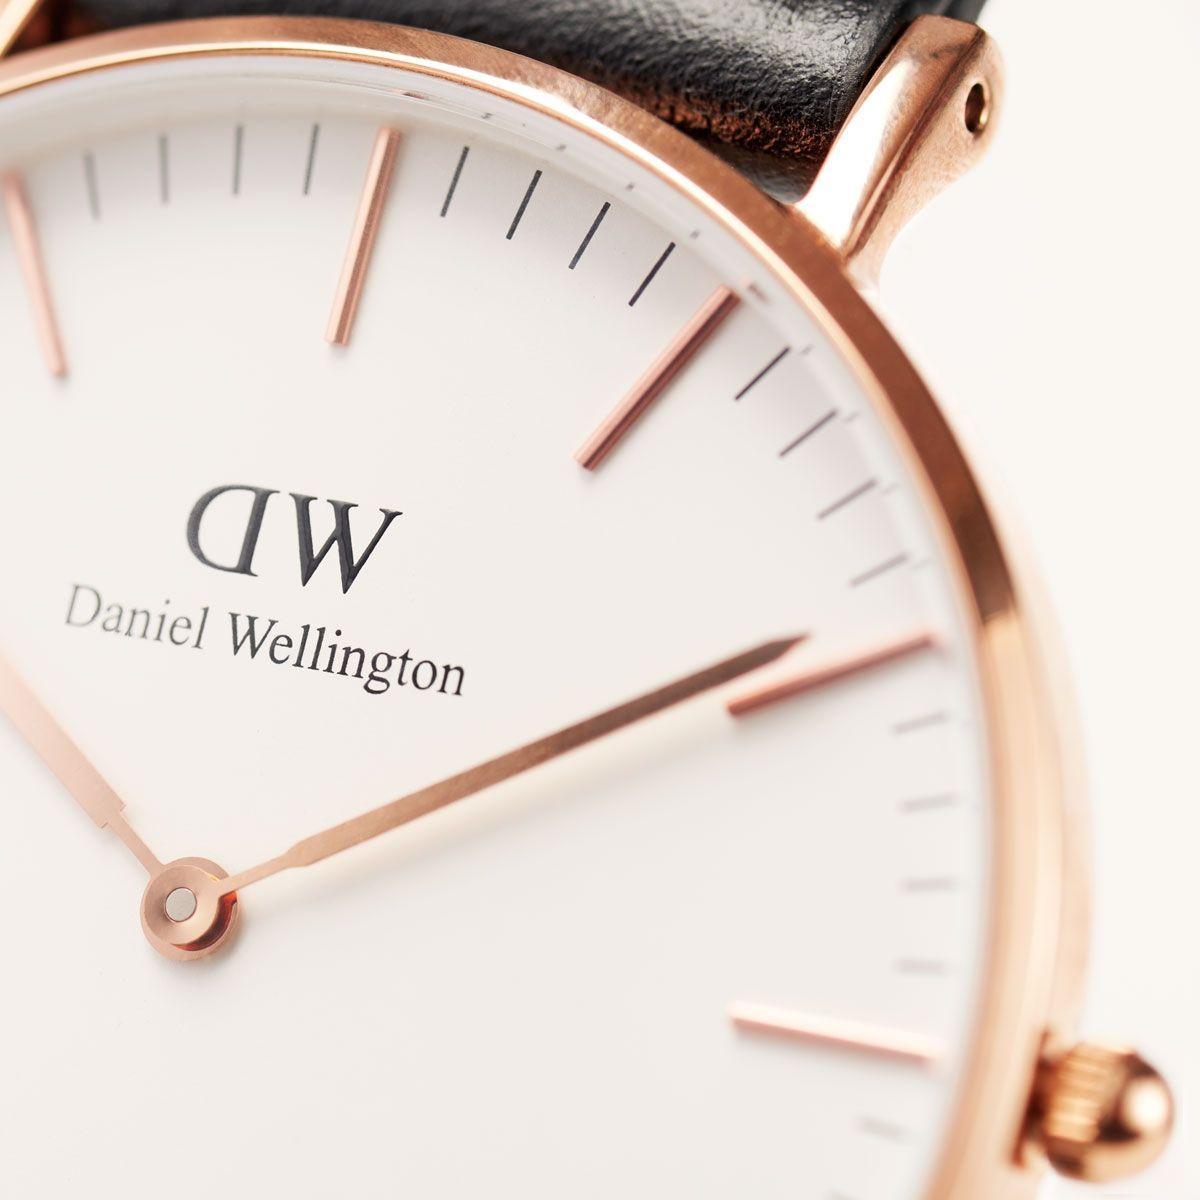 dw官网 dw手表官网 dw中国官网 dw官方旗舰店 DW DW官网  W Classic Durham RG 36mm